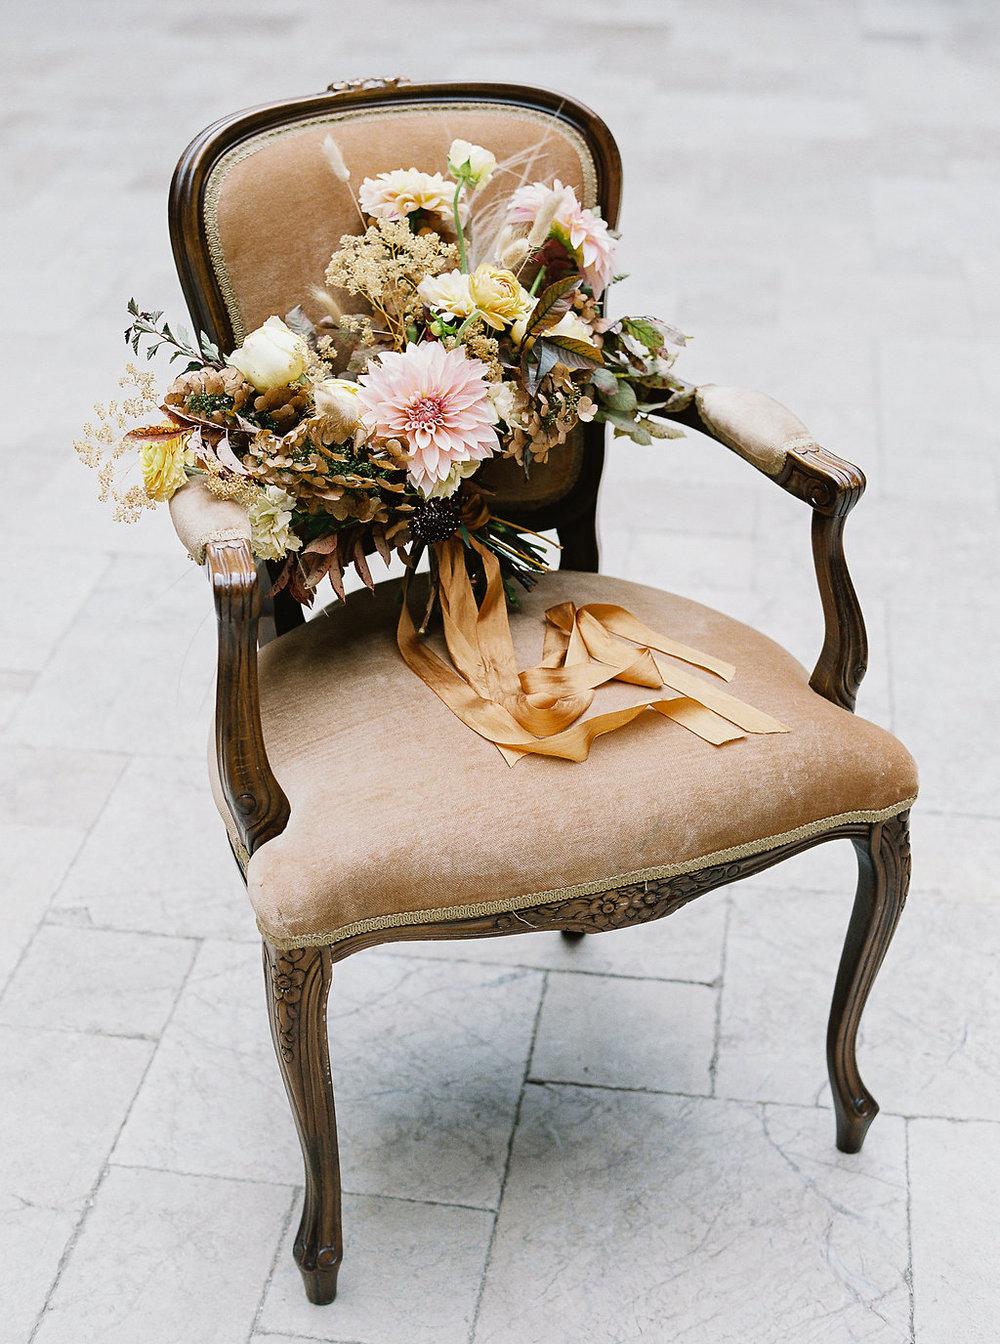 fall-wedding-Jenny-haas-Samantha-joy-events-laurel-court-cincinnati-wedding-bouquet-chair